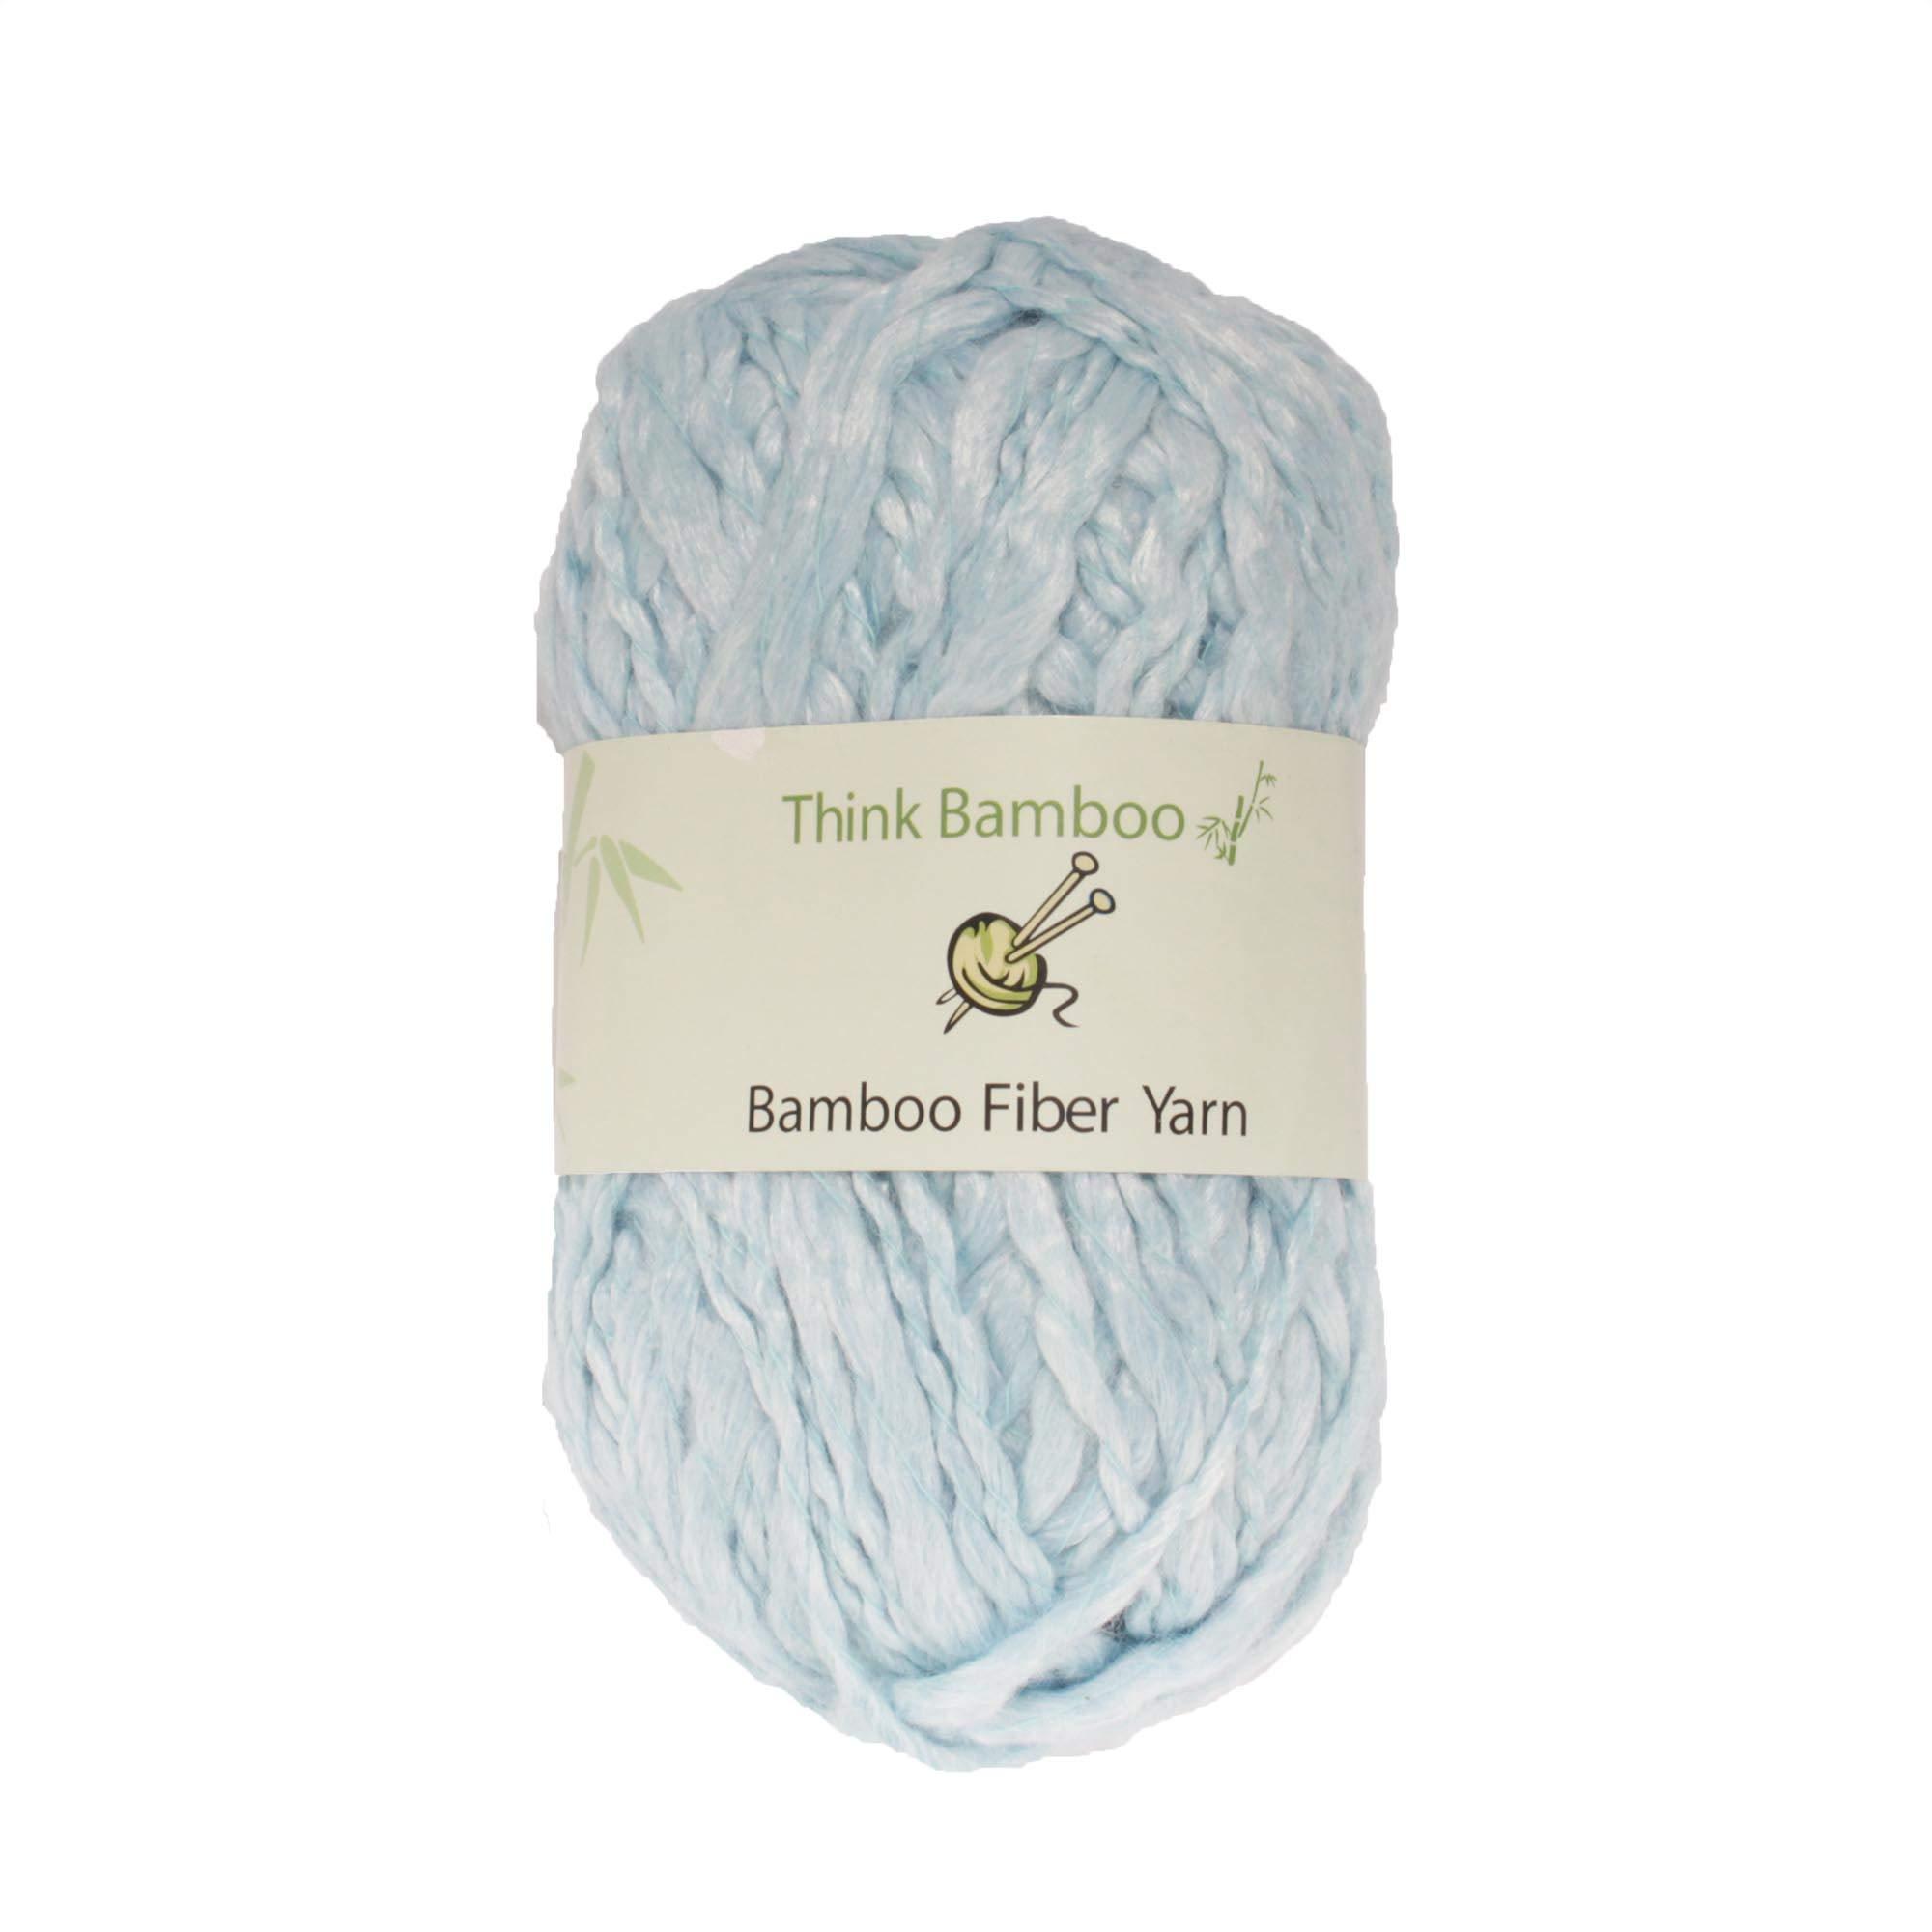 BambooMN Brand - Cotton Candy Blue Thick Thin Bamboo Fiber Wool Yarn - 100g/Skein - 2 Skeins